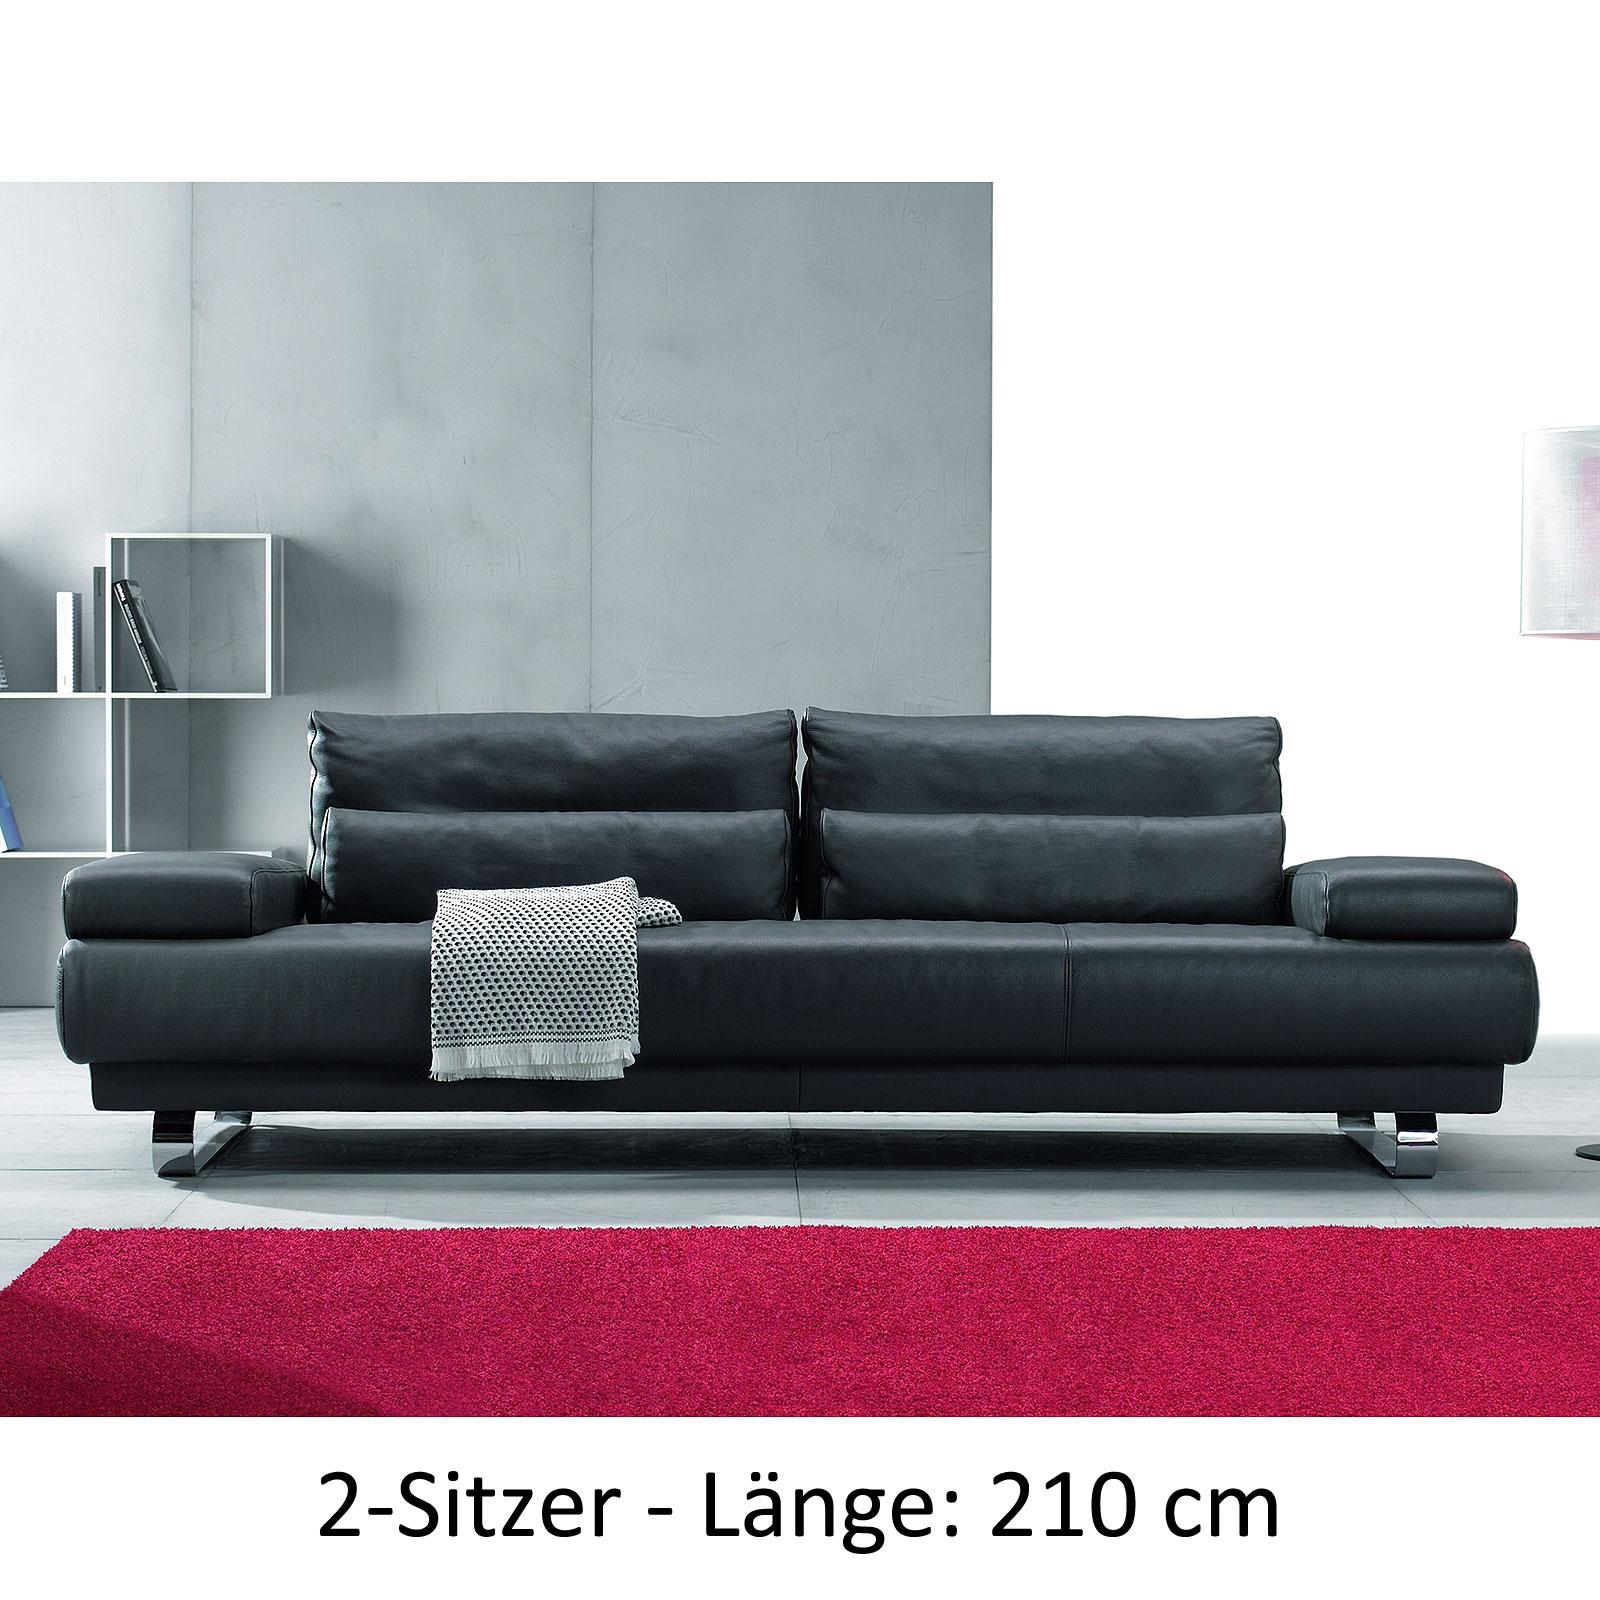 sofa harry leder schwarz sitztiefenverstellung 2 gr en auswahl ewald schillig ebay. Black Bedroom Furniture Sets. Home Design Ideas